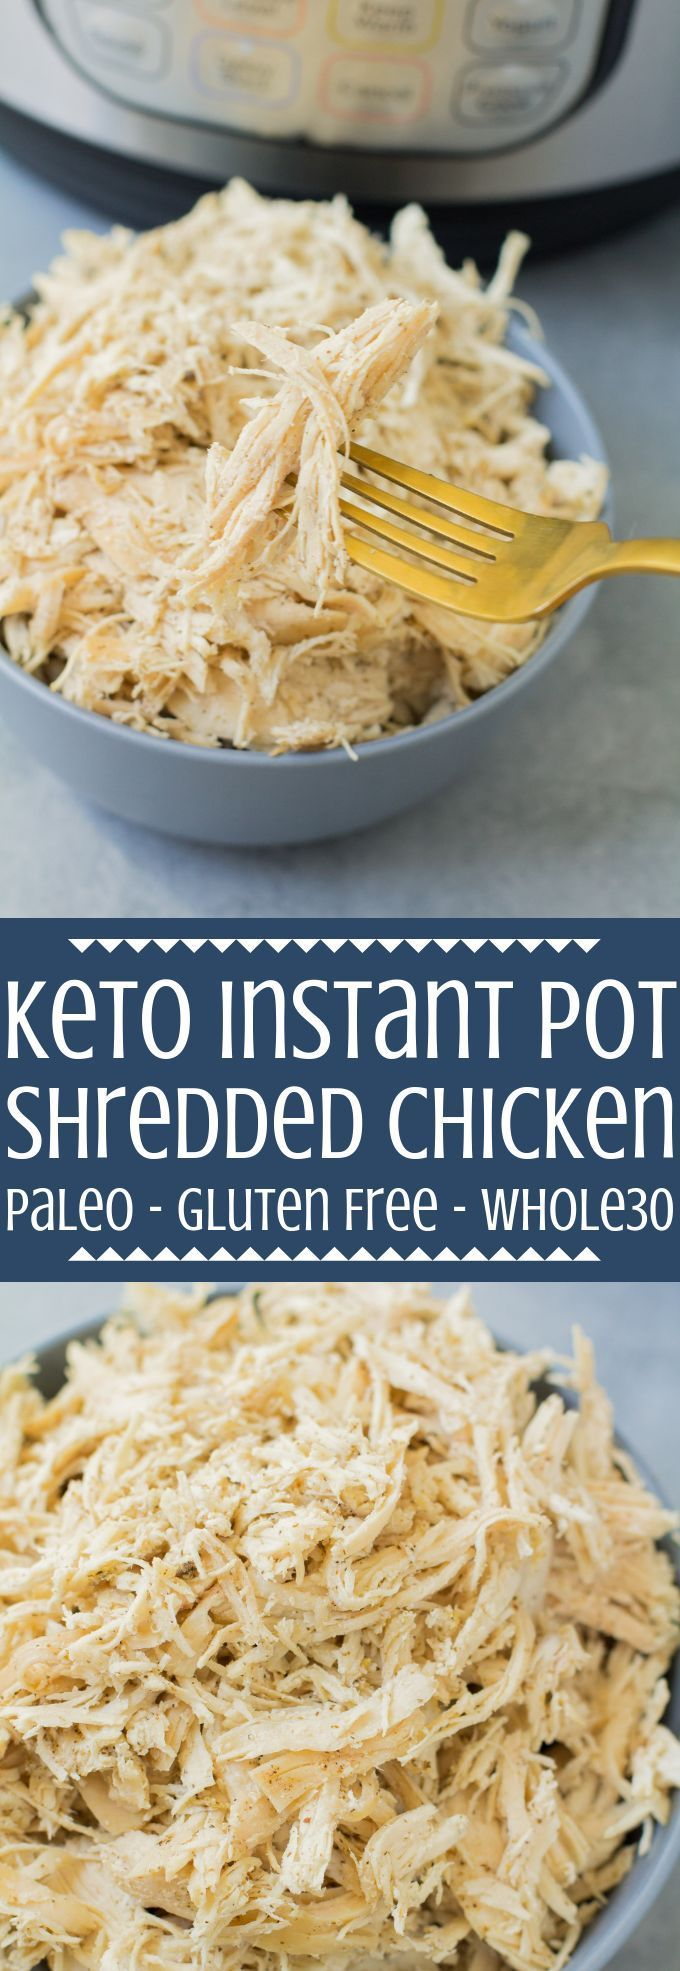 Easy Instant Pot Shredded Chicken images